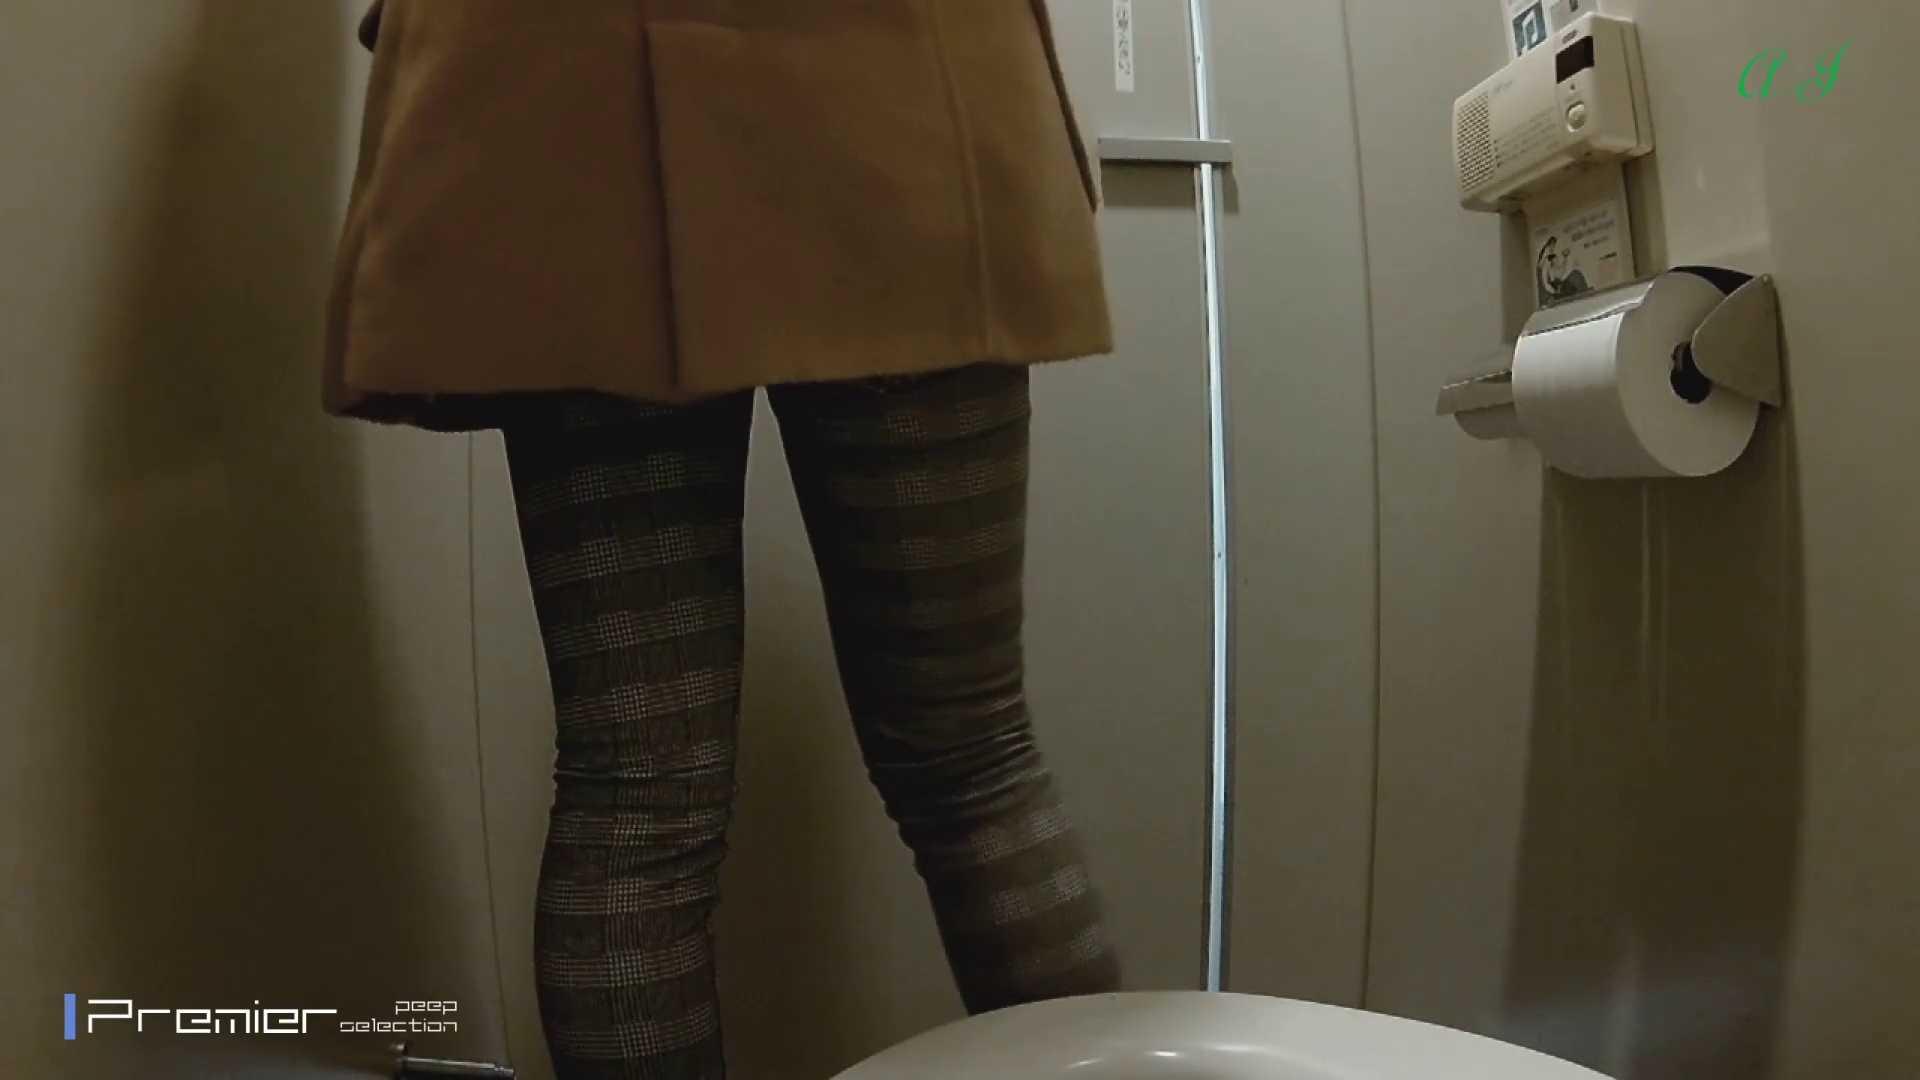 大あり美JDトイレ盗撮【有名大学女性洗面所 vol.80】 高画質  113PIX 34